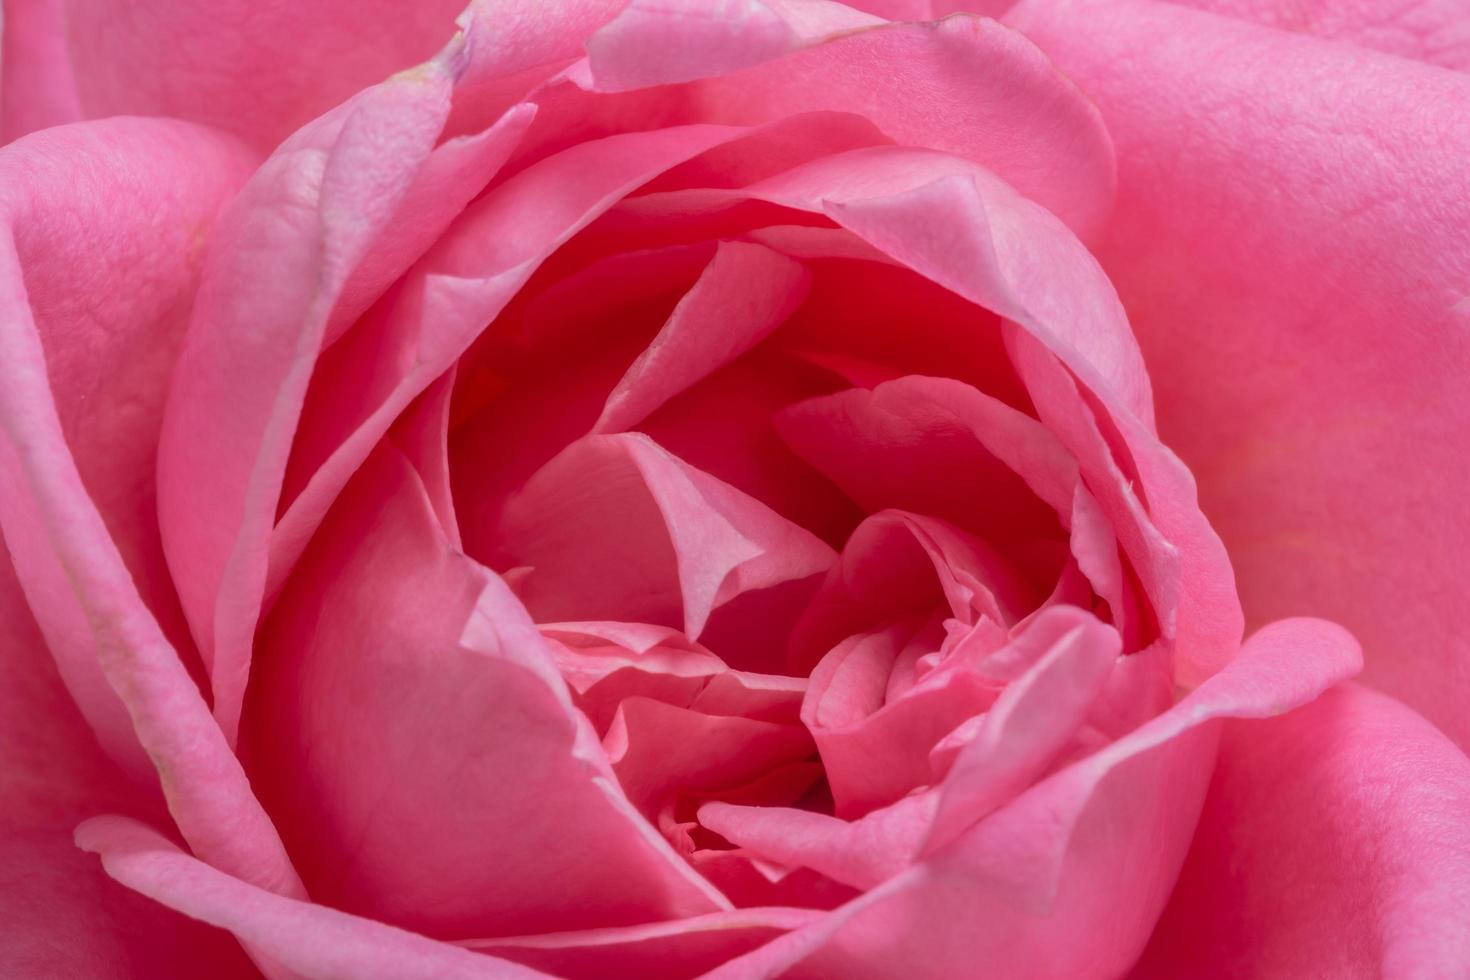 roze roos close-up foto